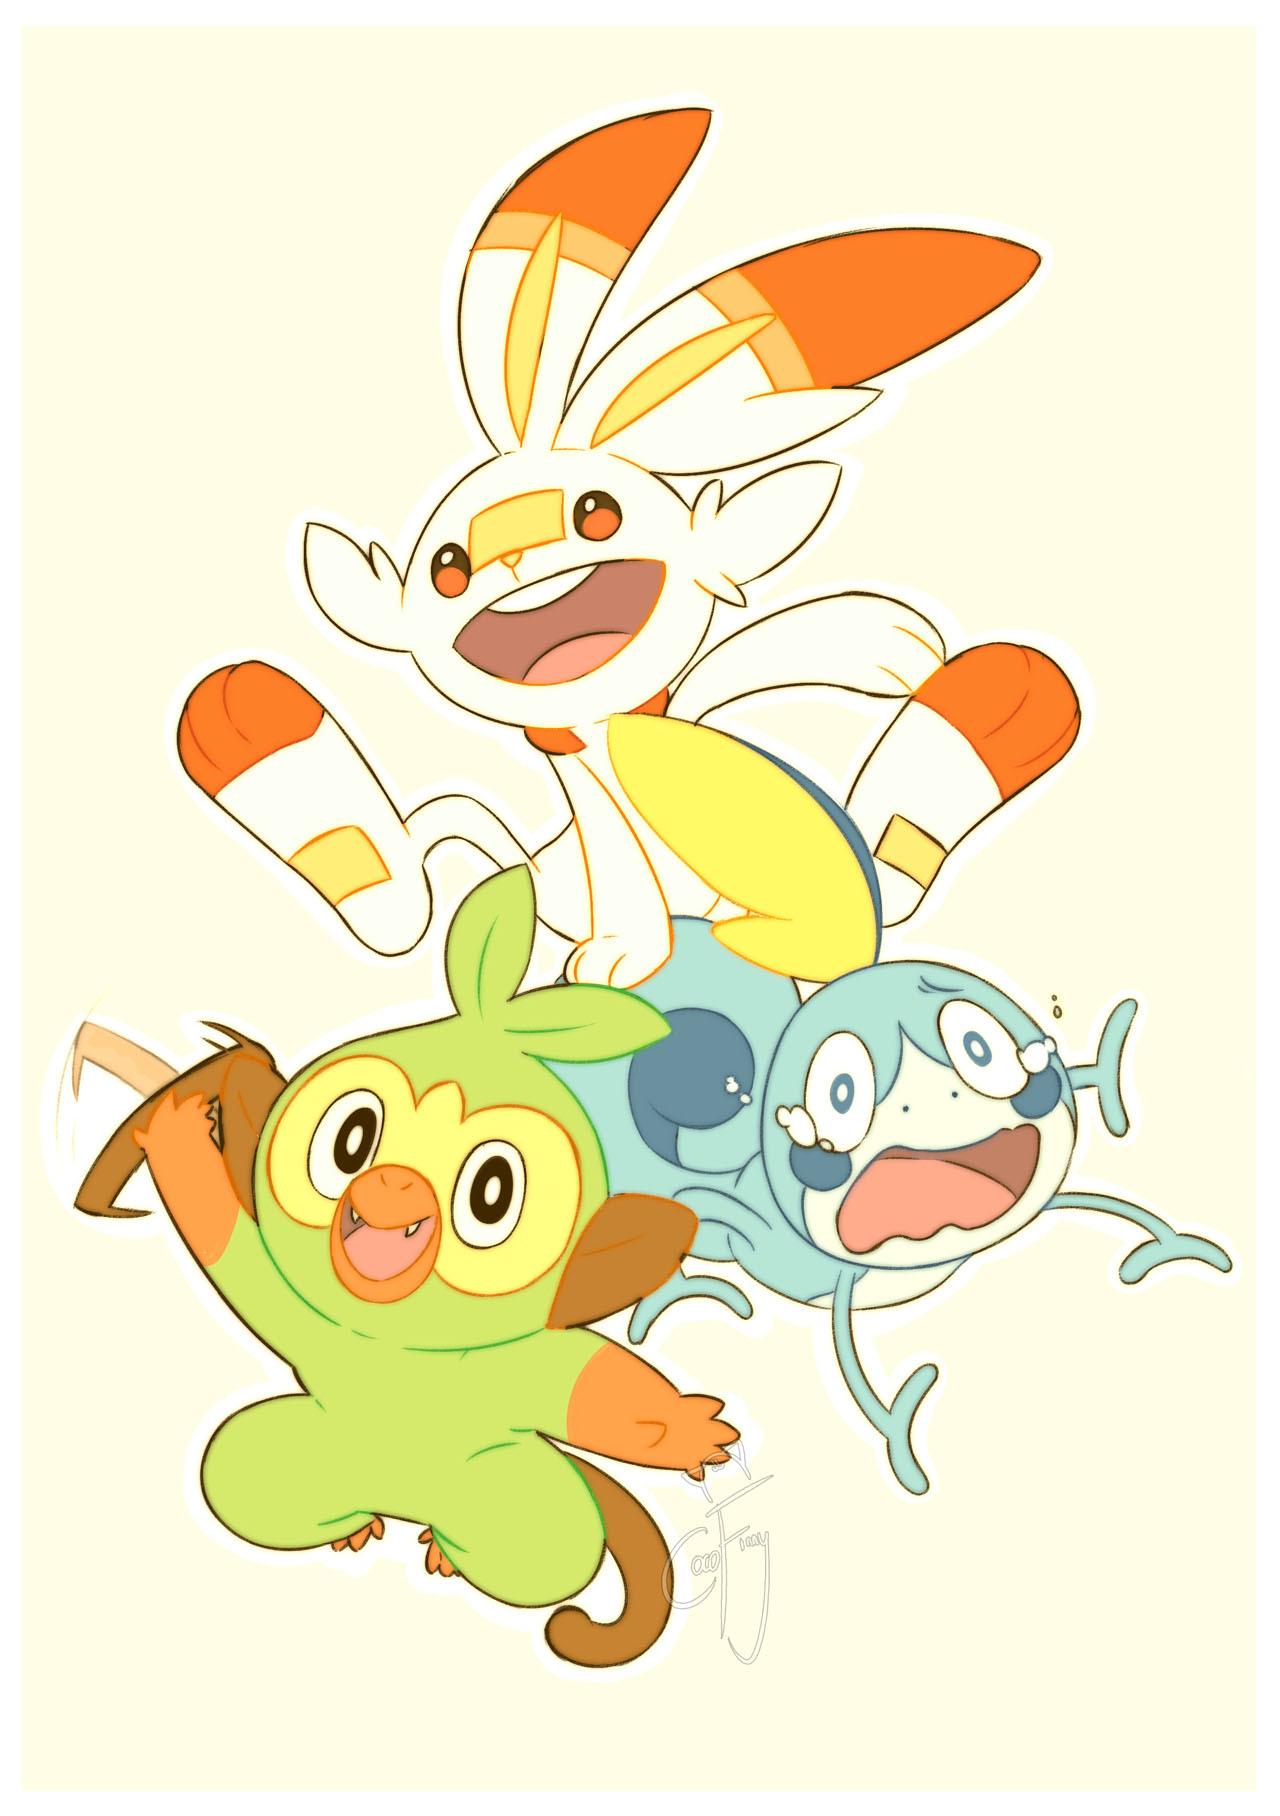 Zygara clipart pokemon jpg freeuse library stick monkey | Tumblr jpg freeuse library